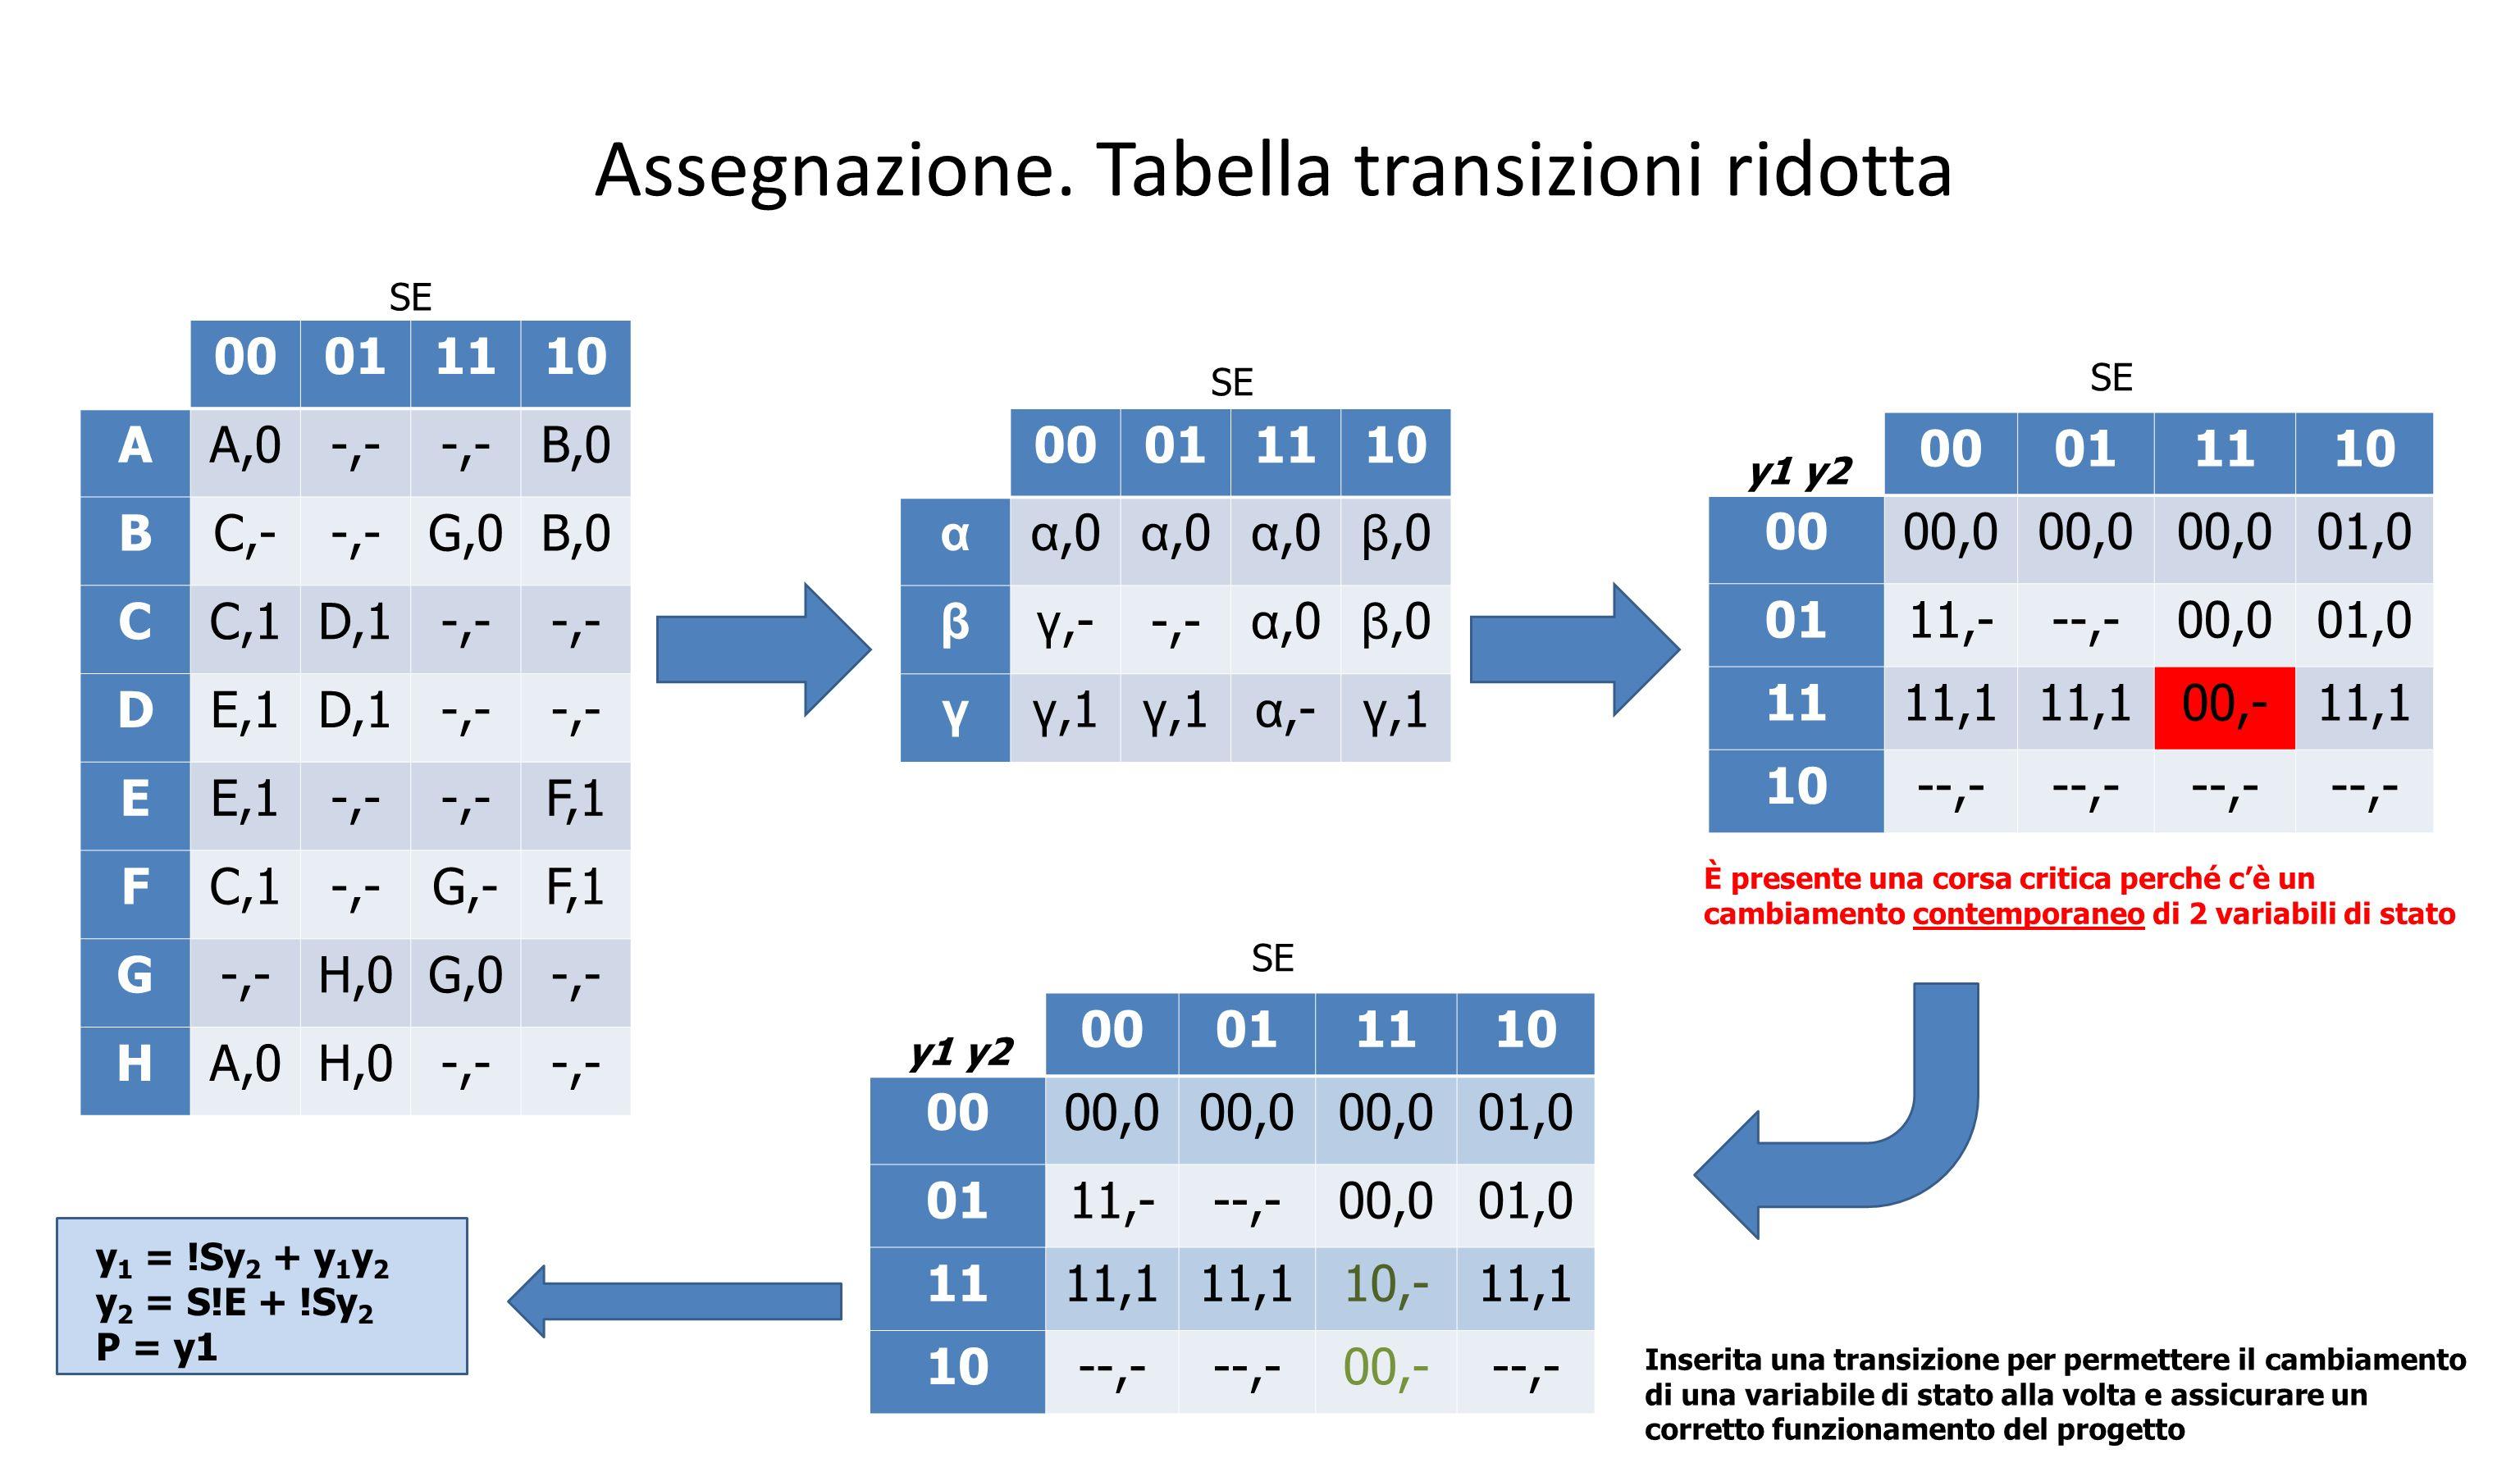 Assegnazione. Tabella transizioni ridotta 00011110 AA,0-,- B,0 BC,--,-G,0B,0 CC,1D,1-,- DE,1D,1-,- EE,1-,- F,1 FC,1-,-G,-F,1 G-,-H,0G,0-,- HA,0H,0-,-